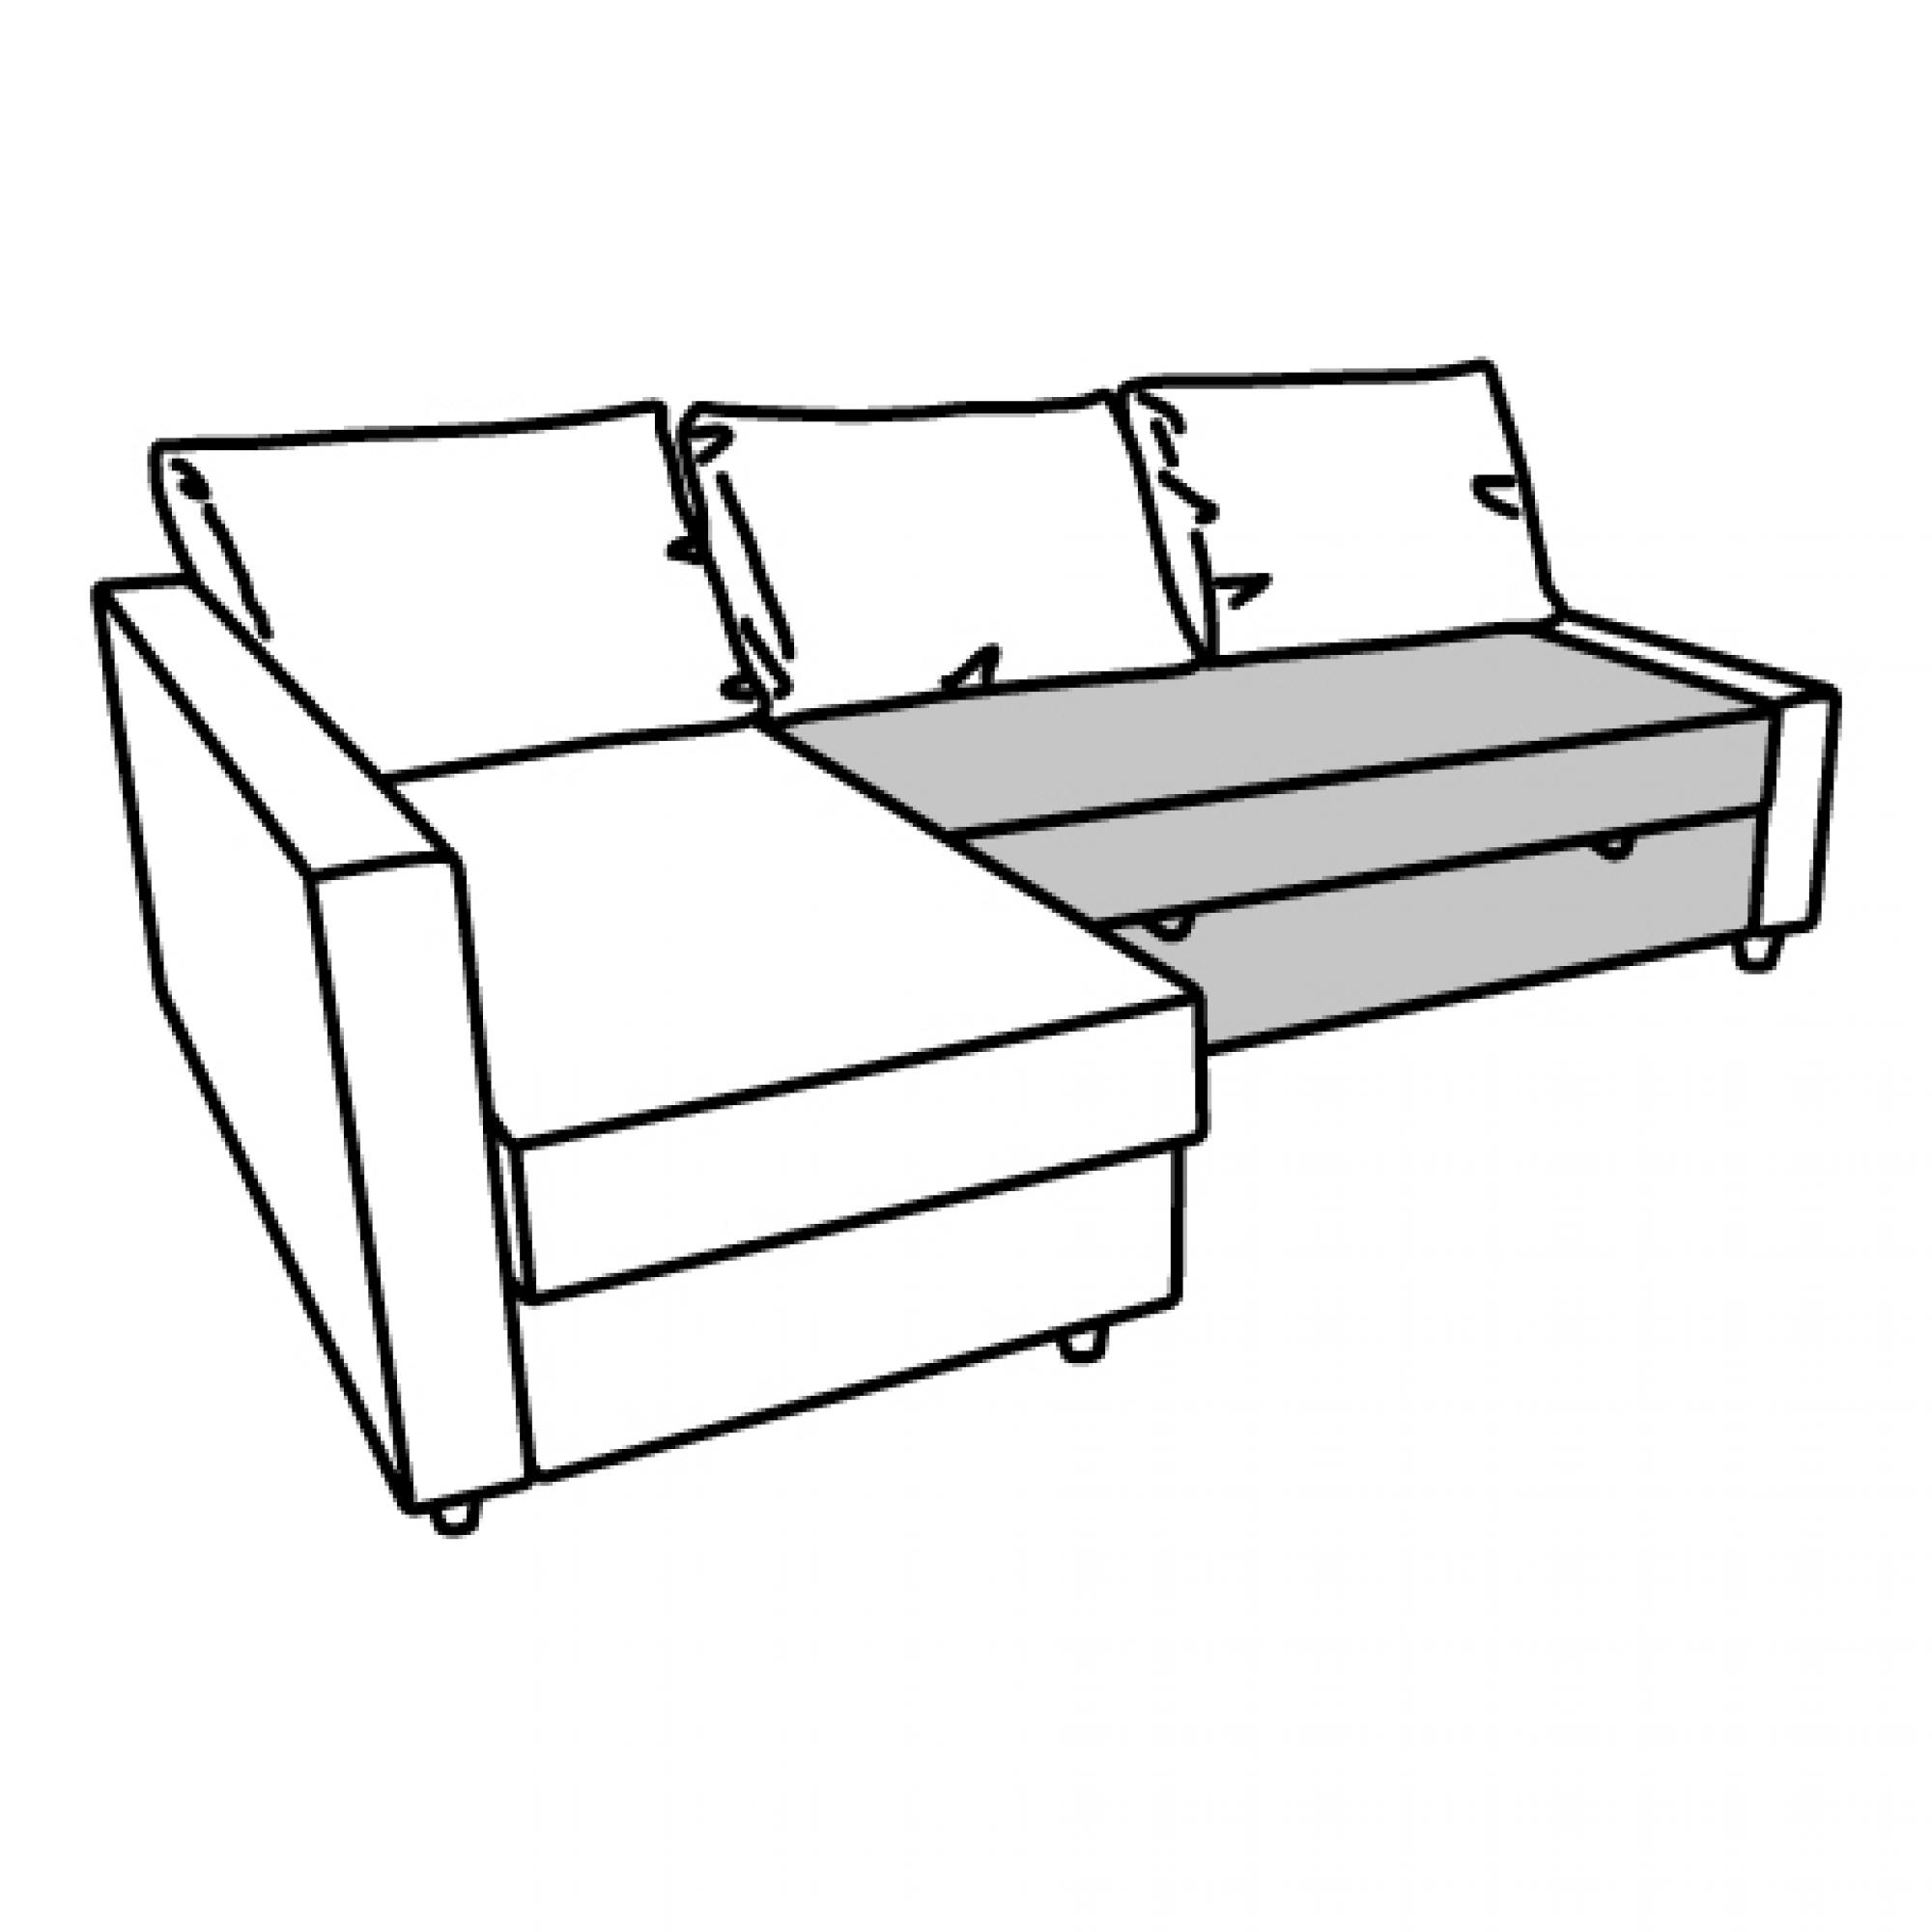 FRIHETEN seat section for corner sofa-bed dark brown